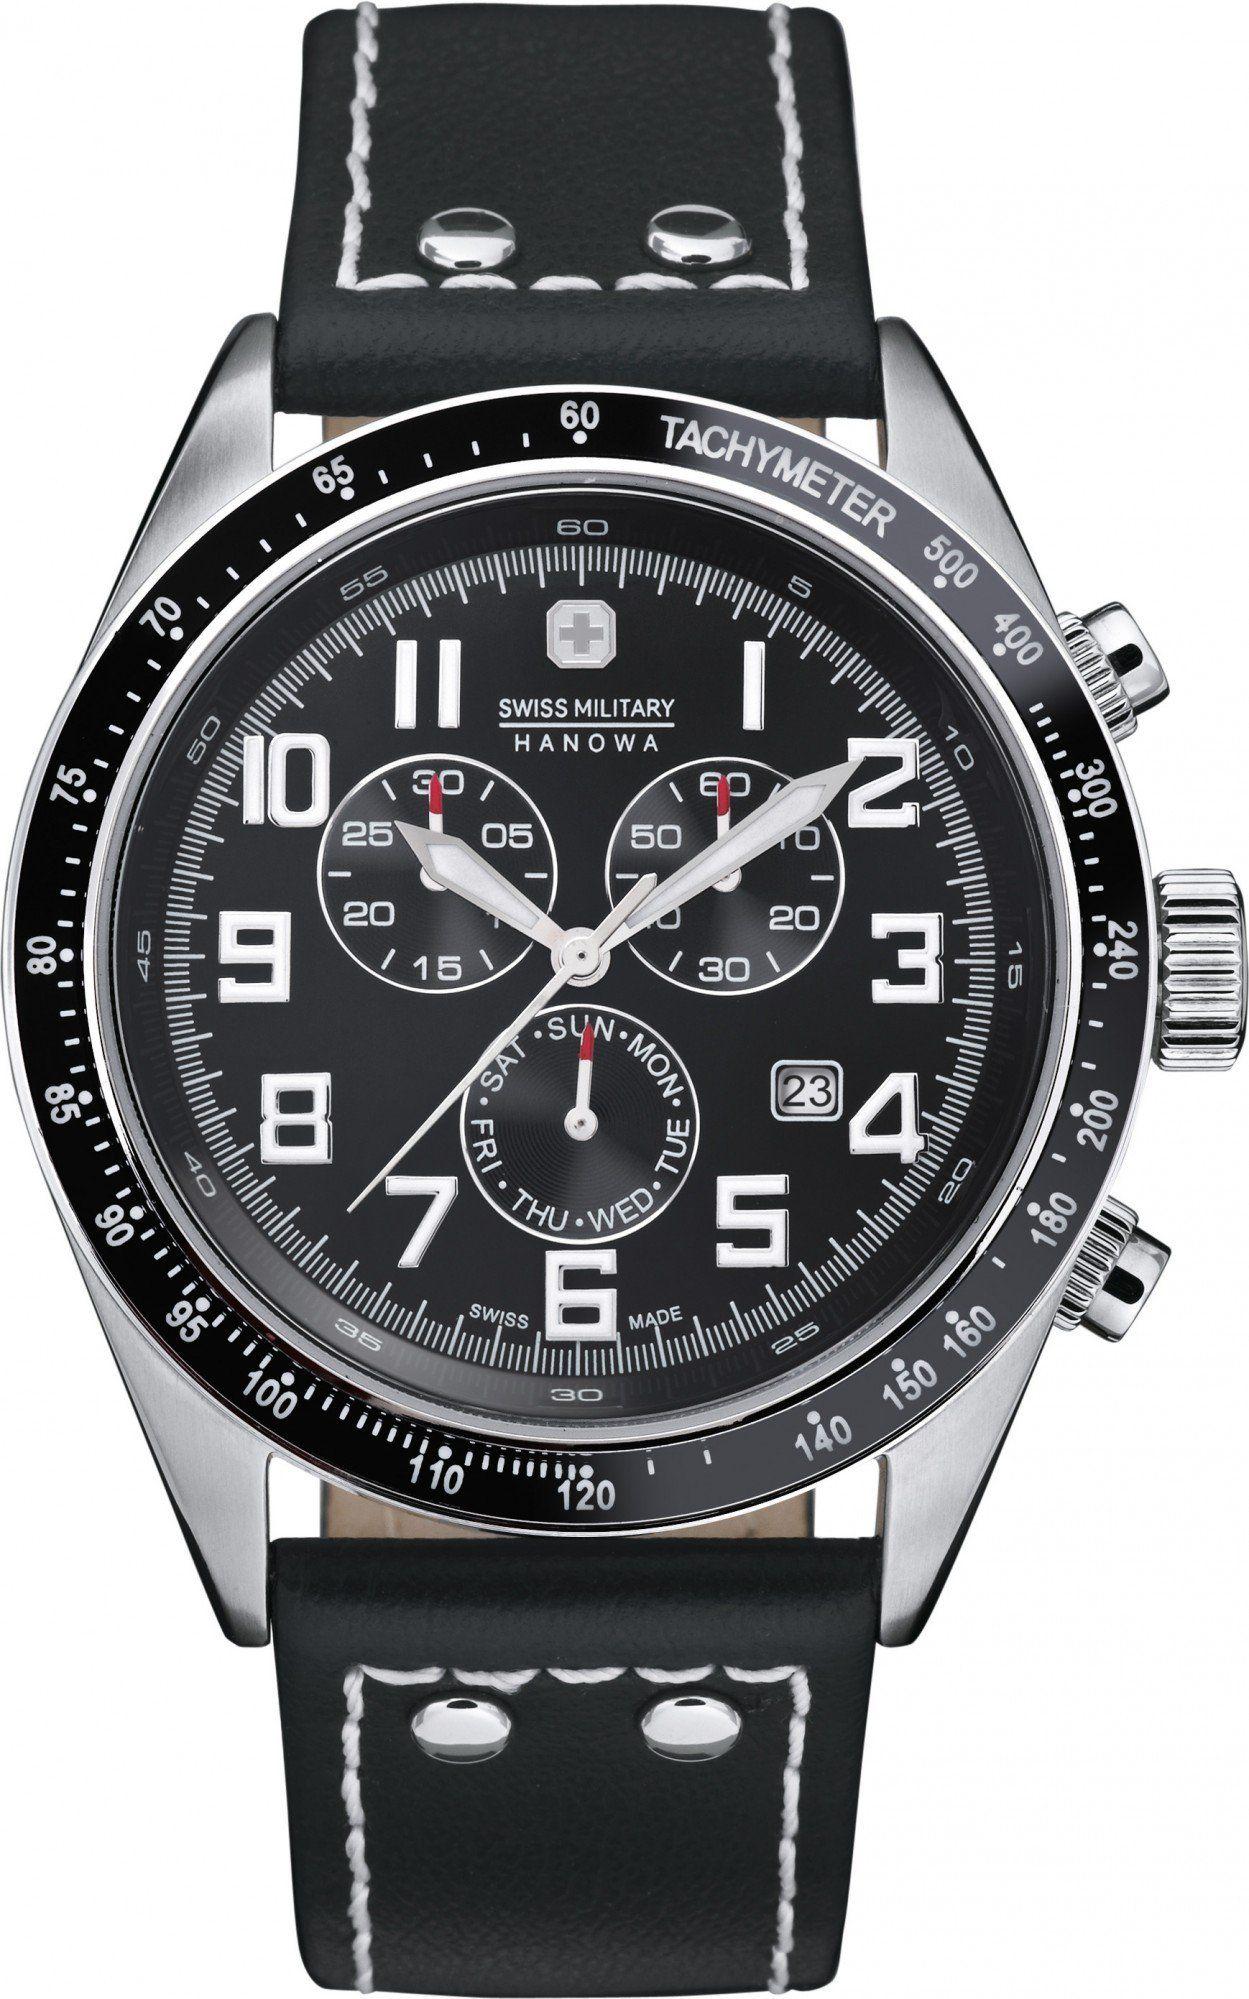 Swiss Military Hanowa Herren-Armbanduhr XL Analog Quarz Leder 06-4197.04.007